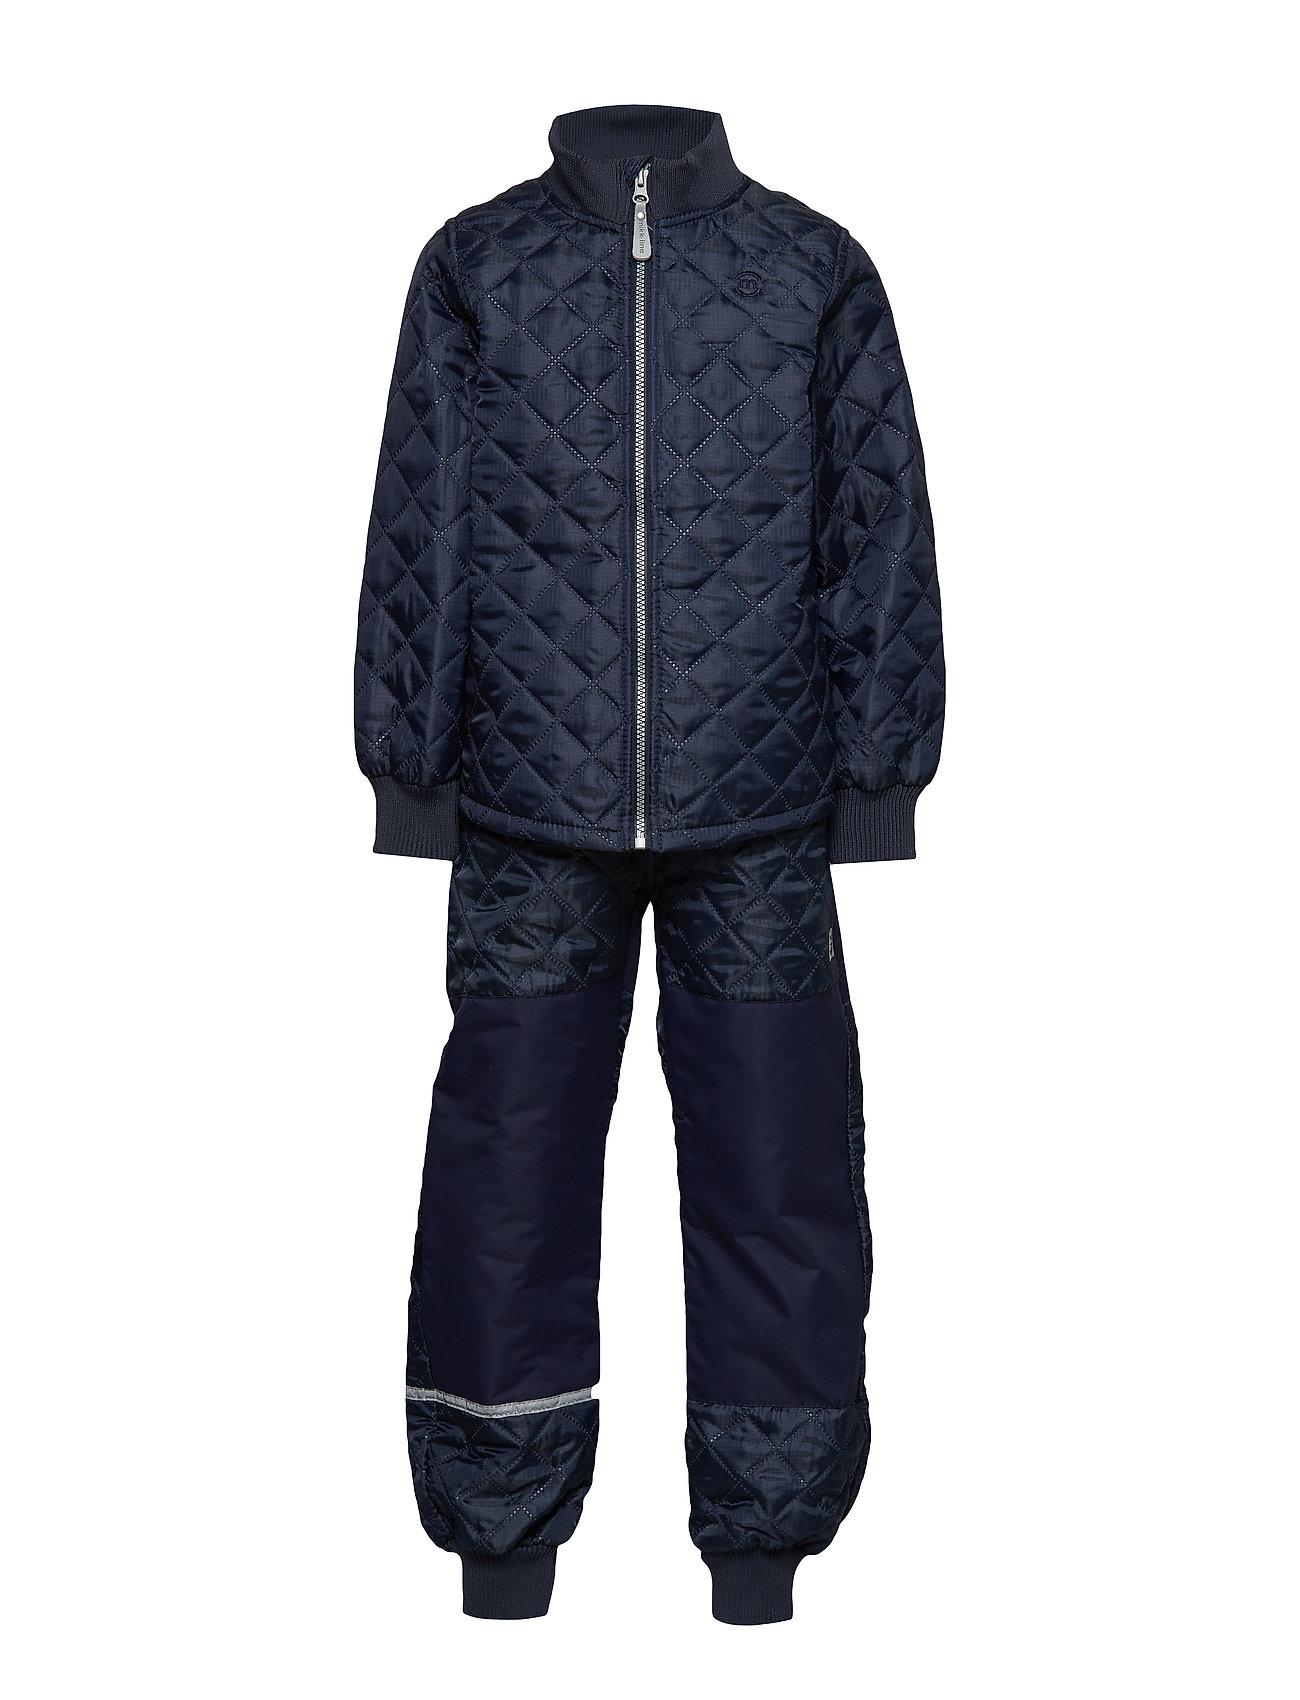 Mikk-Line THERMO Set - No Fleece - 286/DARK MARINE